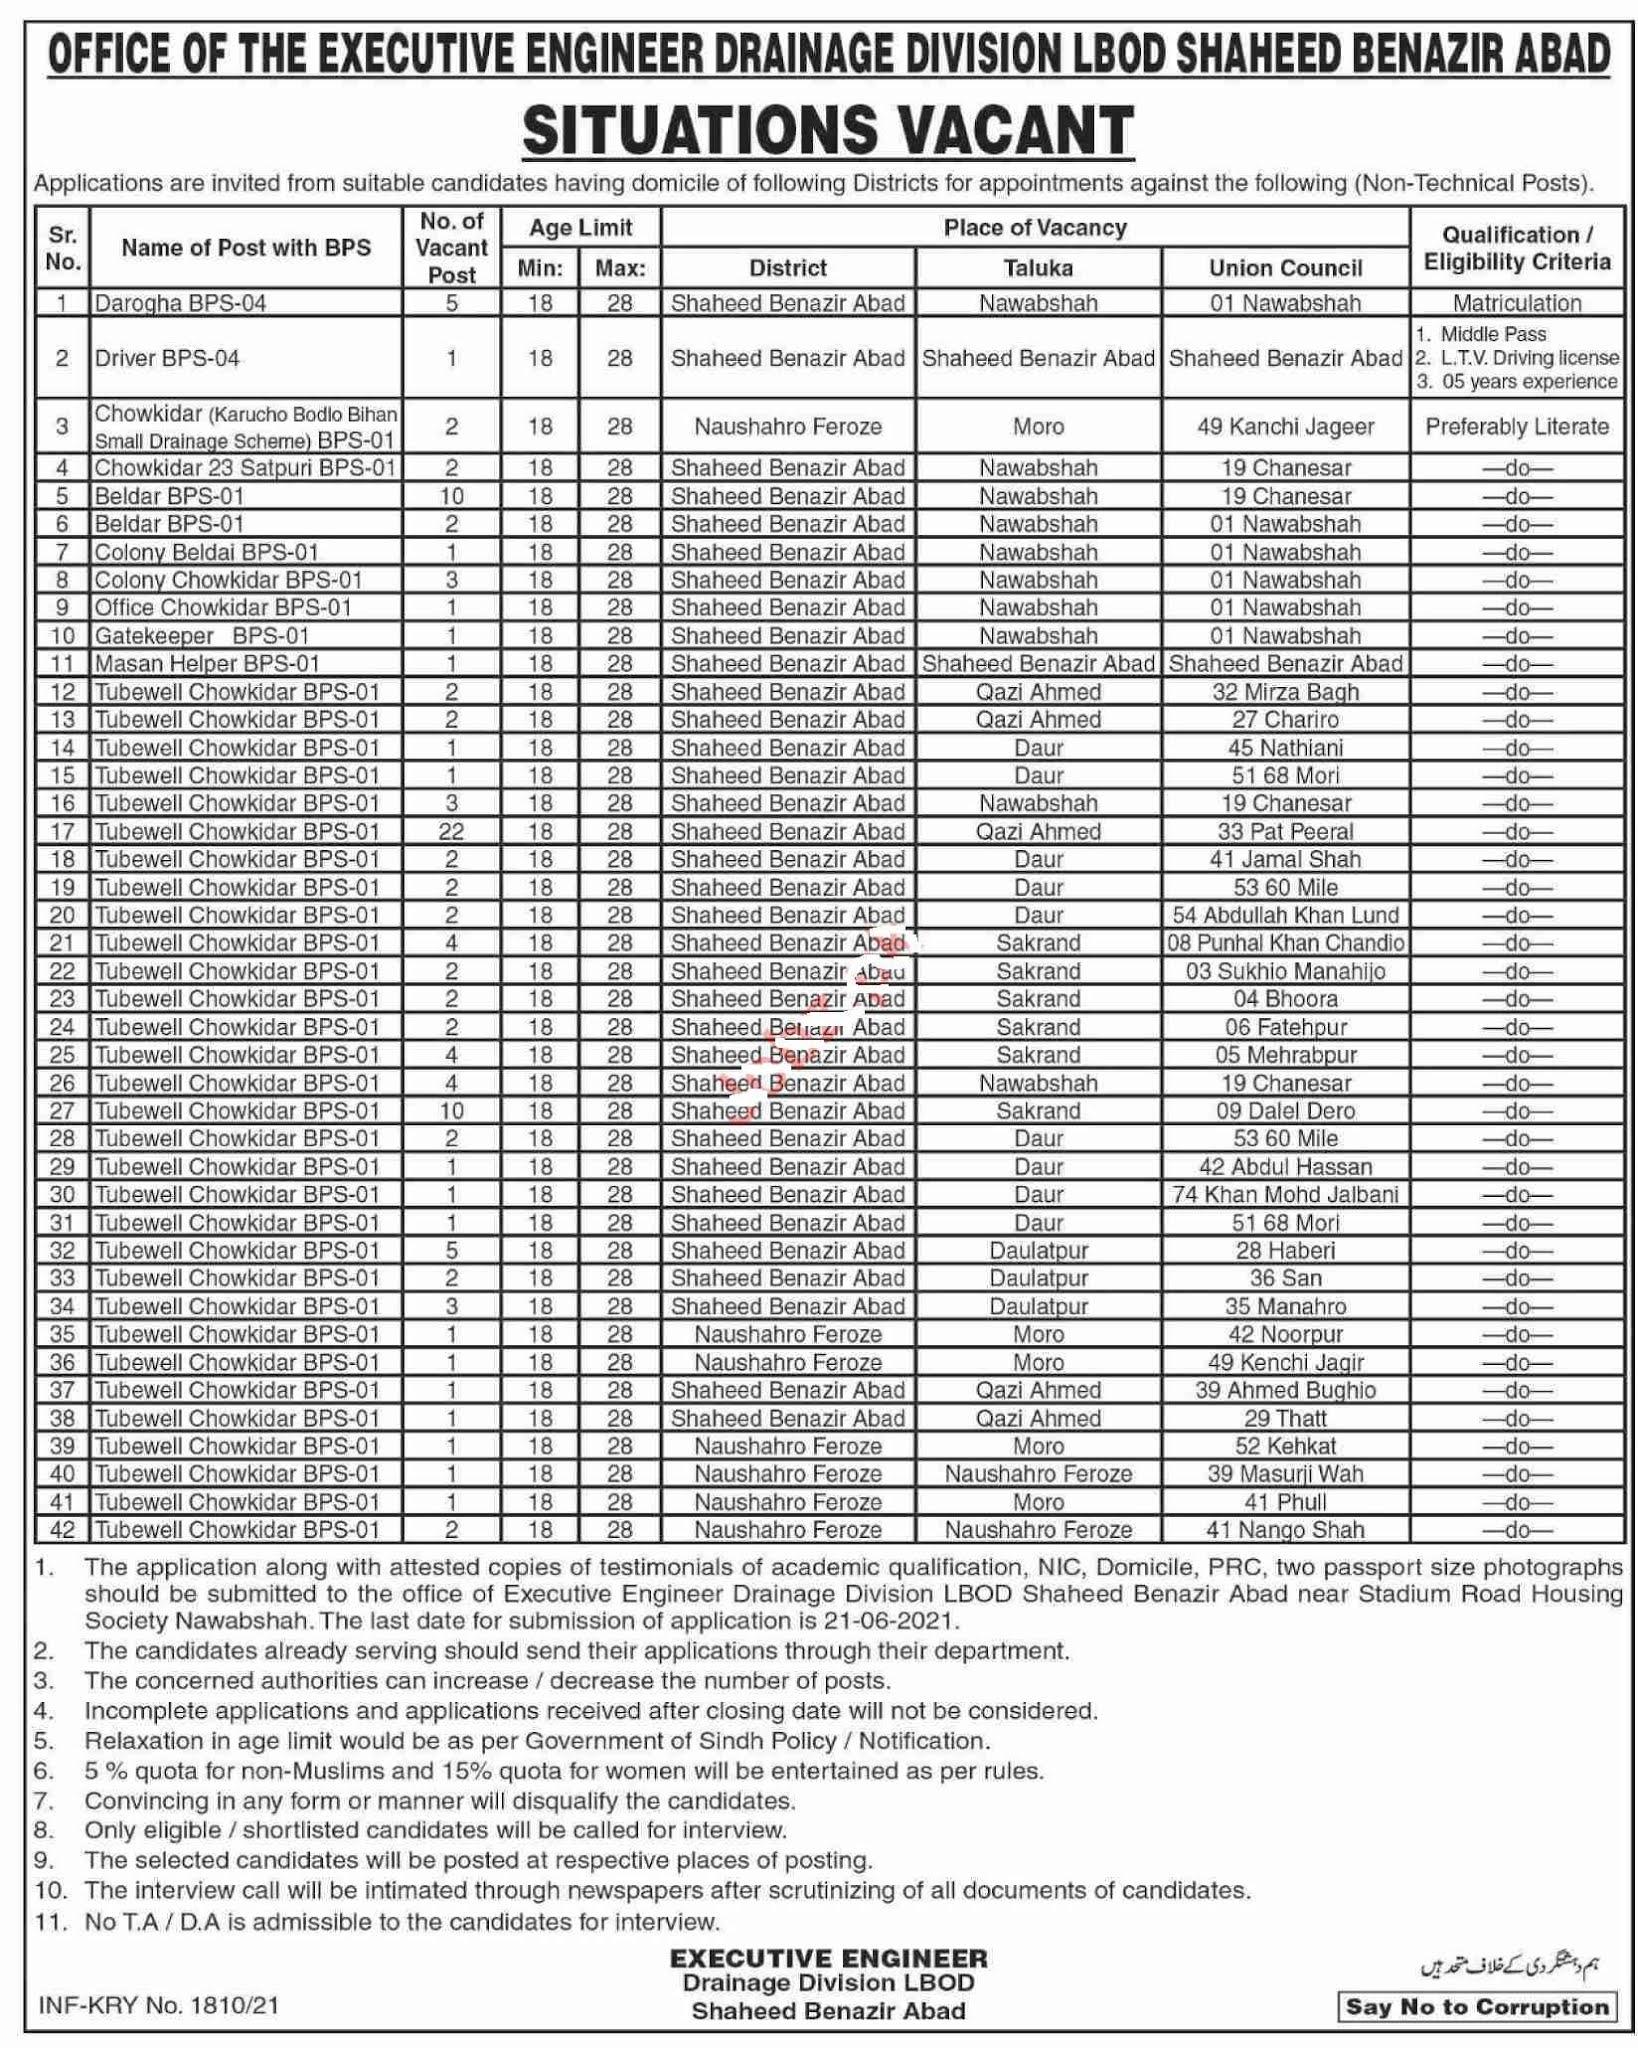 Drainage Division LBOD Shaheed Benazirabad Jobs 2021 For Driver, LTV Driver, Chowkidar, Beldar, Colony Beldai, Colony Chowkidar, Gate Keeper, Masan Helper, Tubewell Chowkidar.